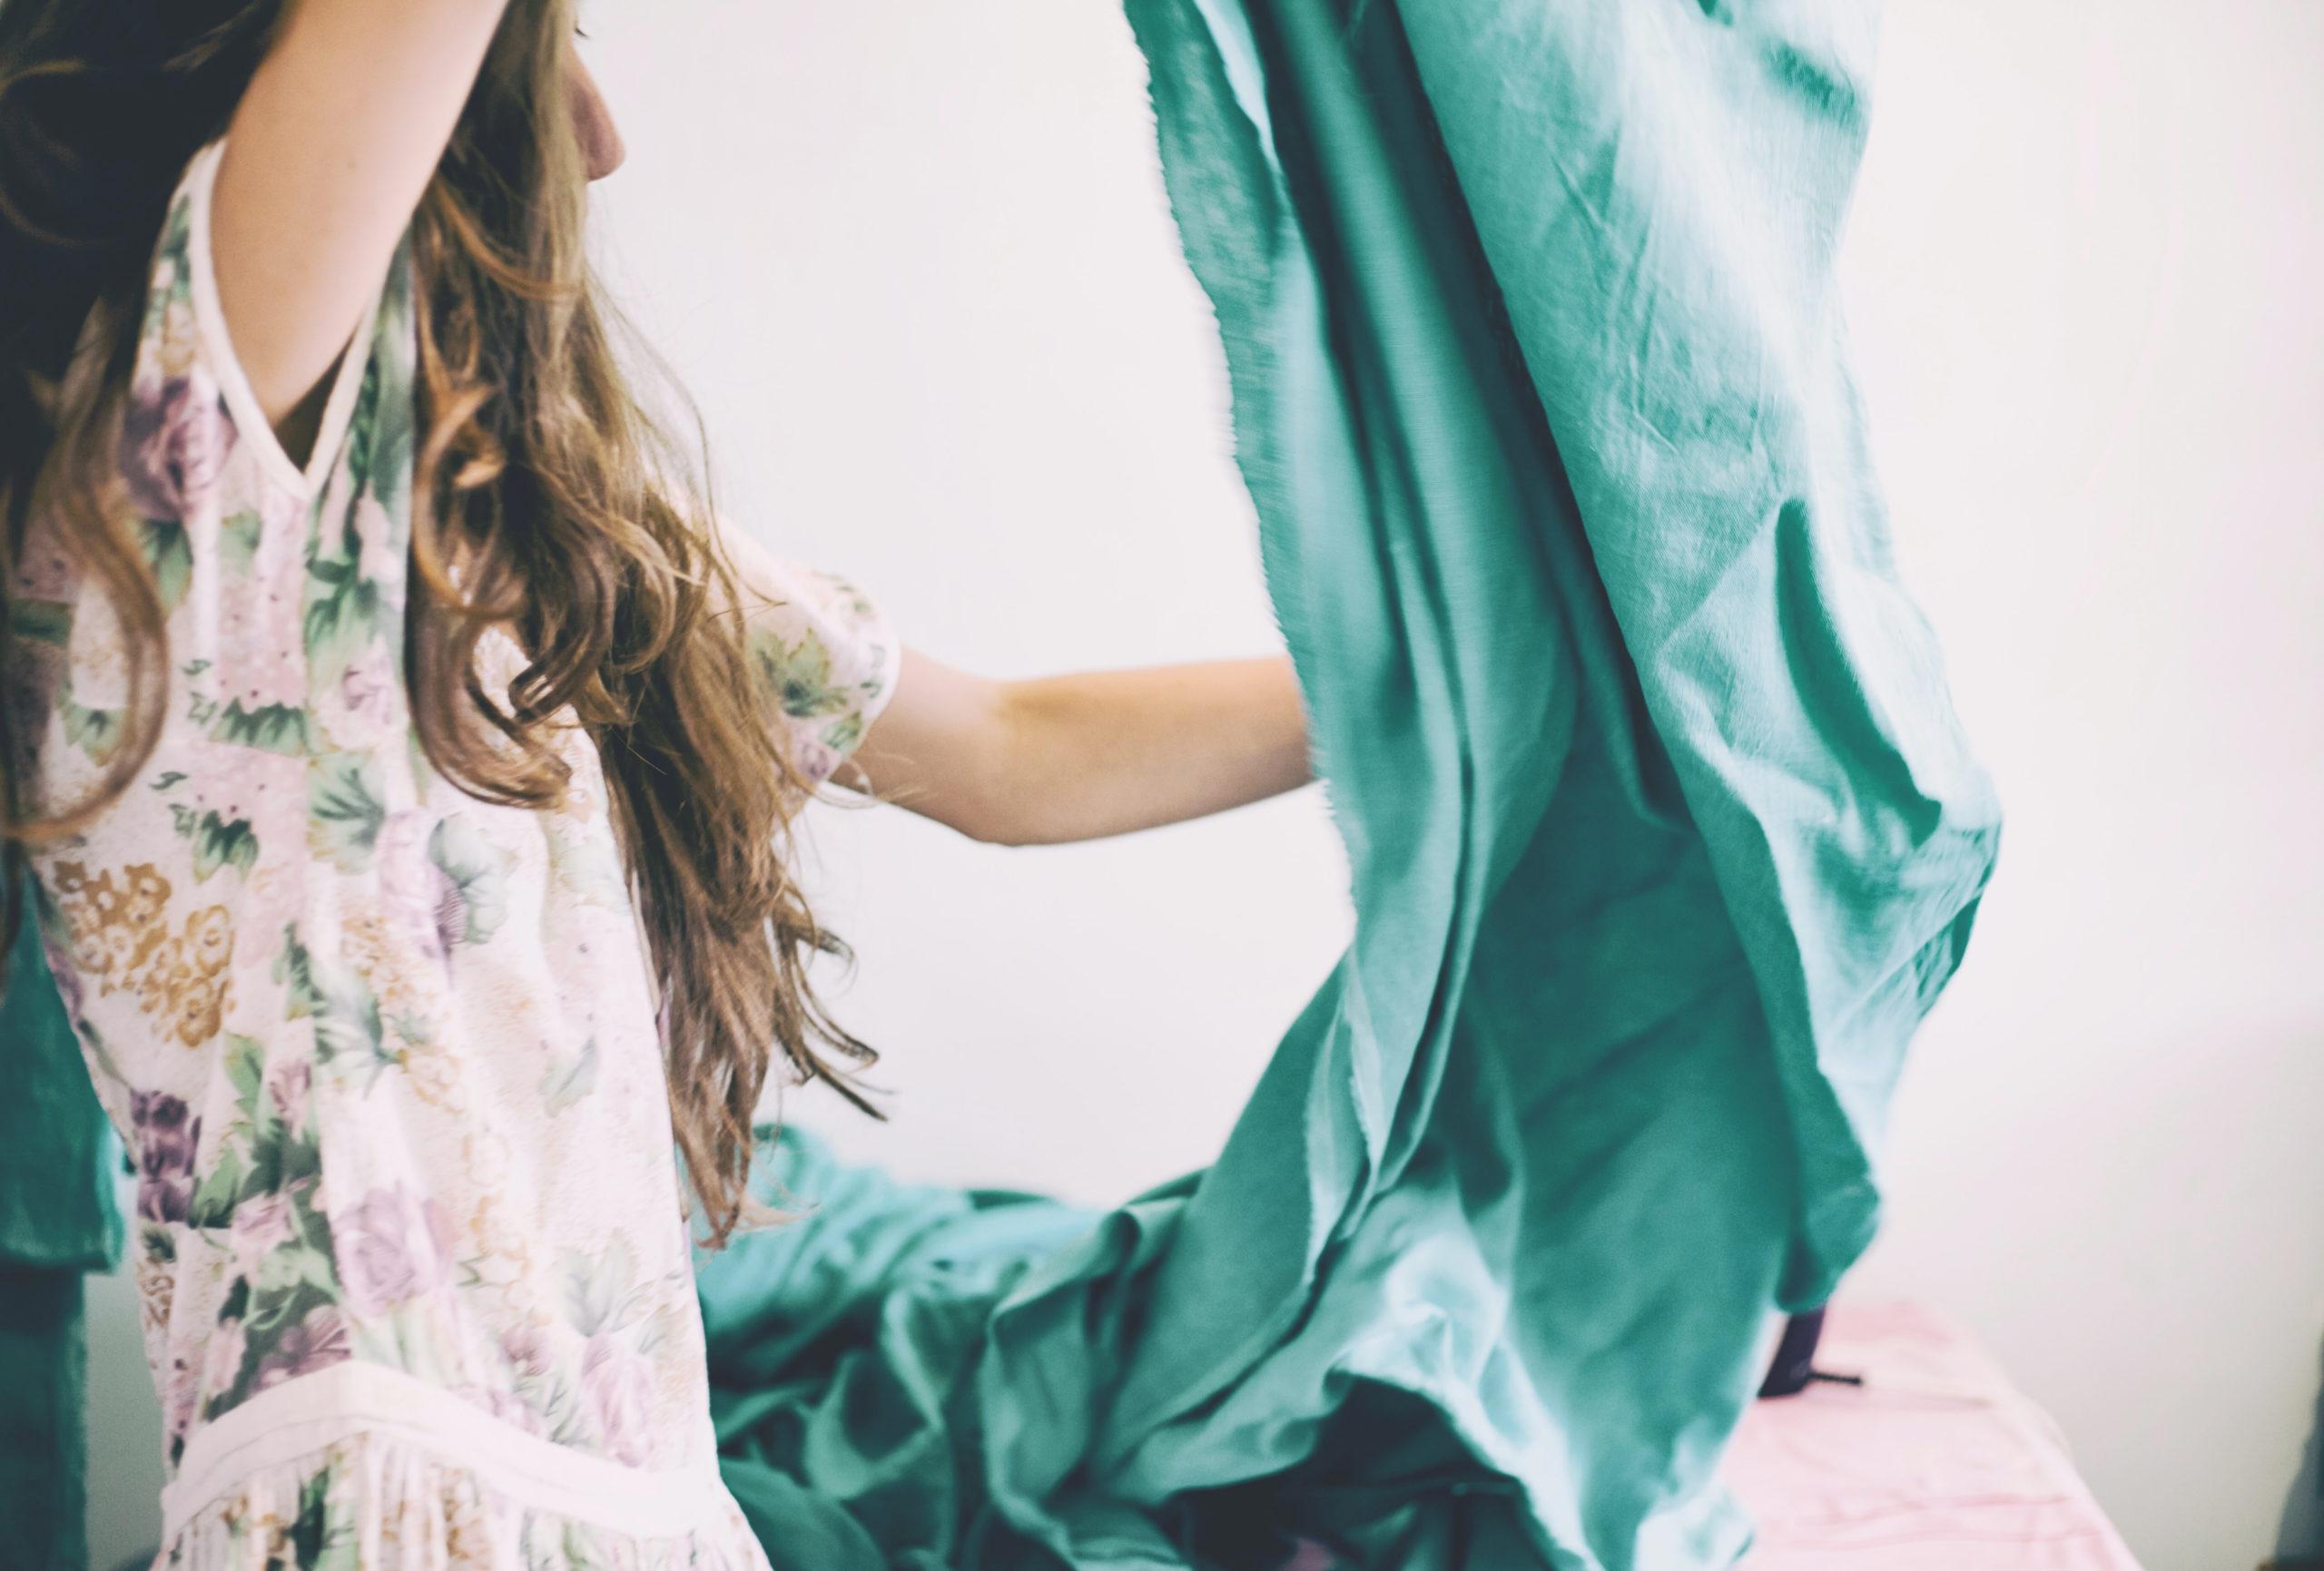 Woman detangling green bedding